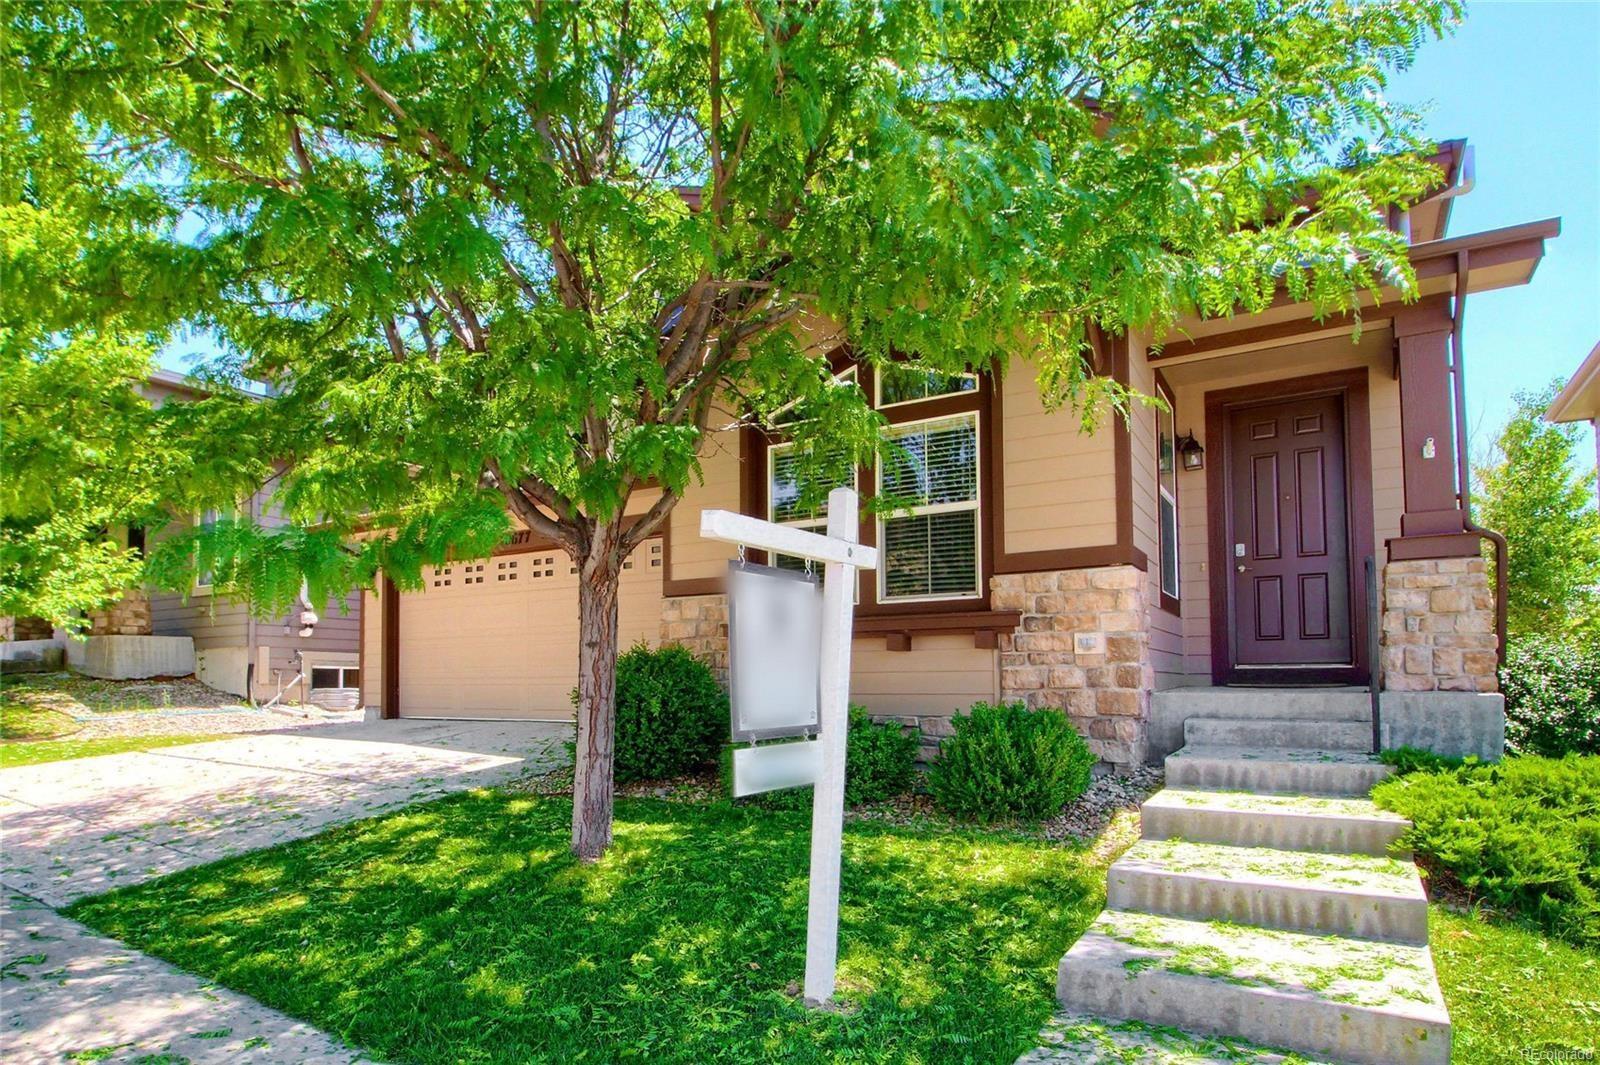 MLS# 3018887 - 1 - 10677 Cedarcrest Circle, Highlands Ranch, CO 80130